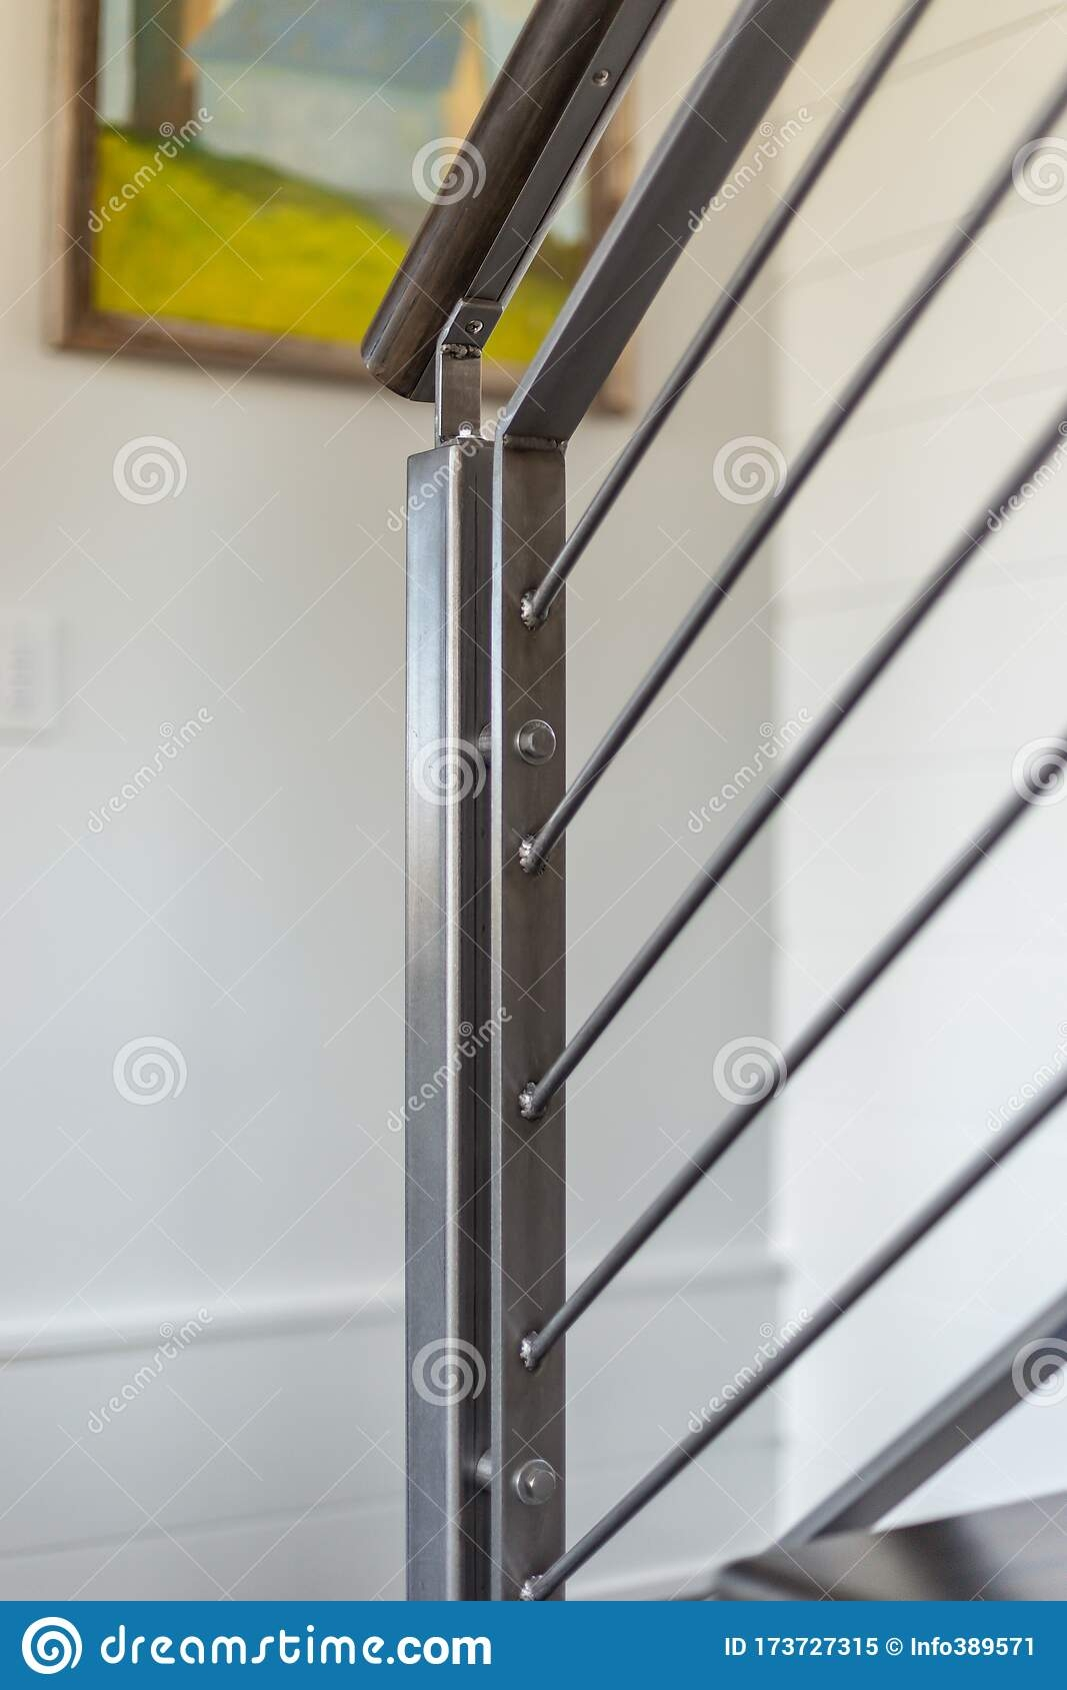 Custom Metal Stair Railing In White Interior Stock Image Image   Modern Metal Railings Interior   Modern Style   Railing Design   Fancy   Modern Aluminium   Decorative